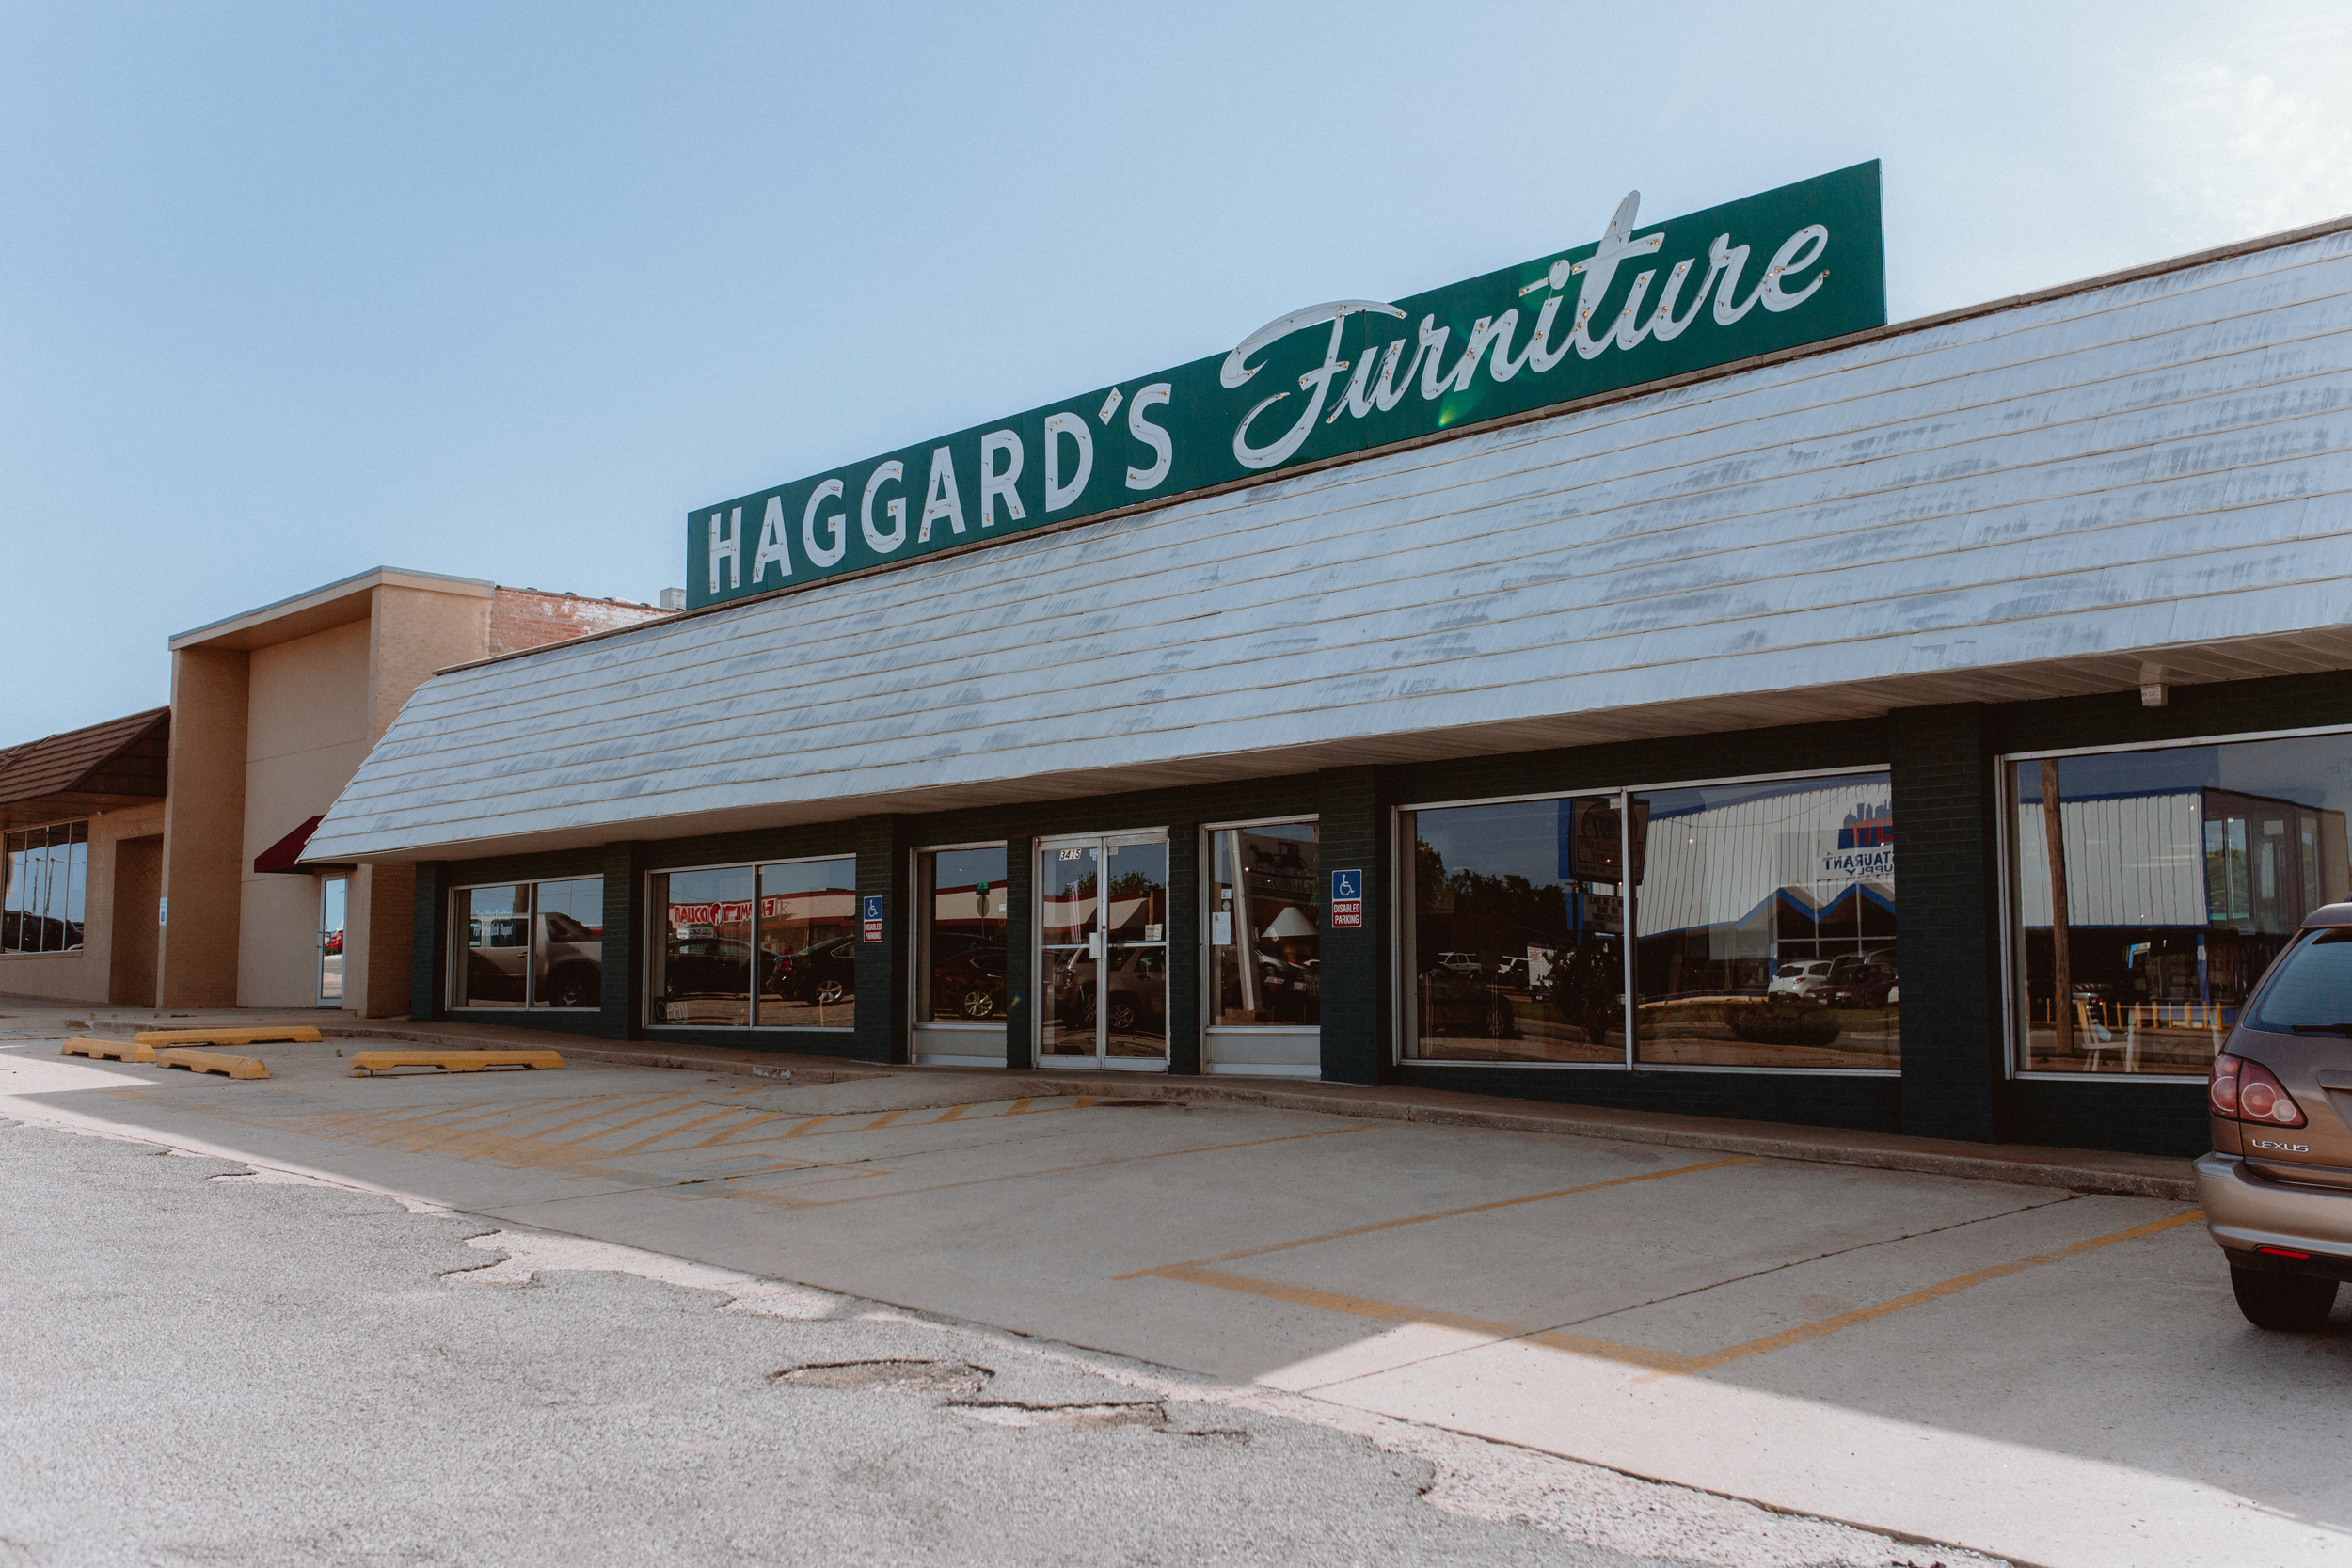 Haggard's Fine Furniture